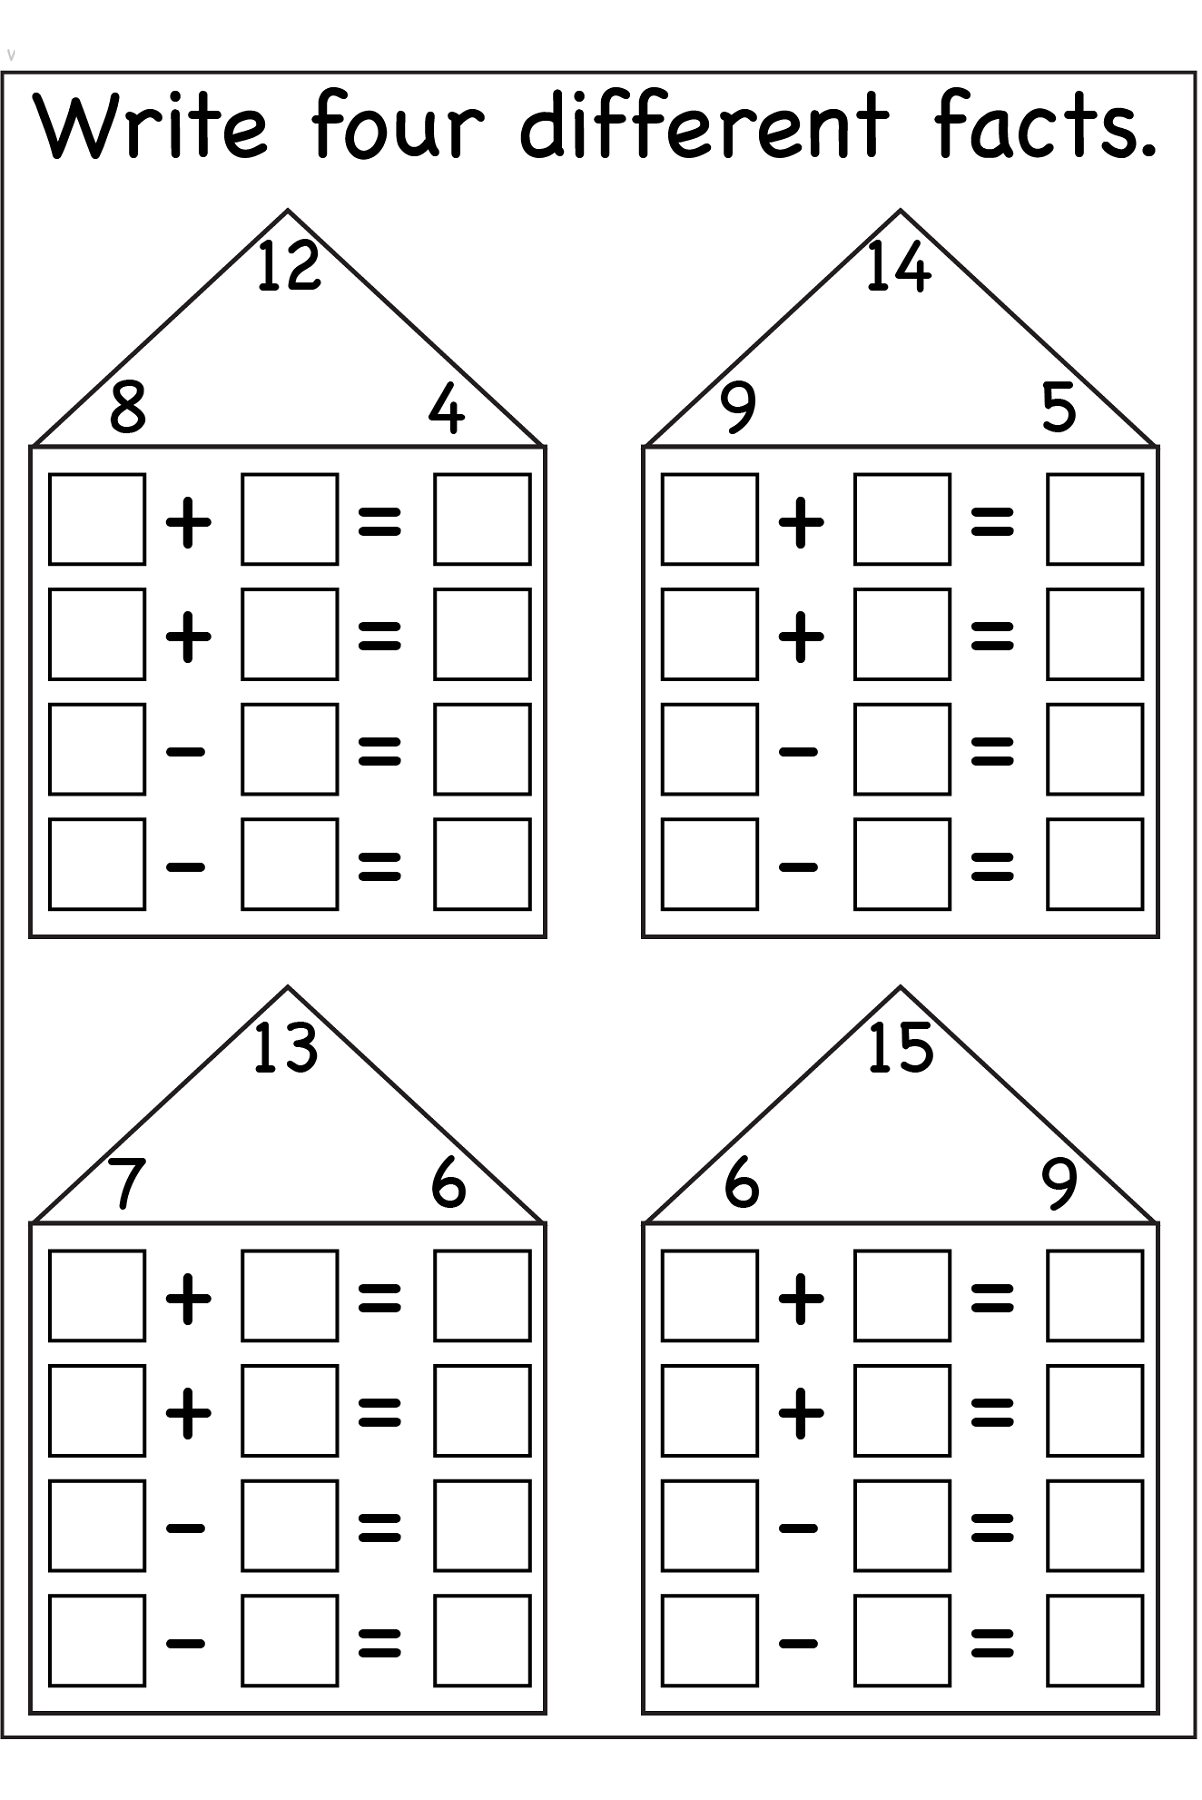 Fact Family Worksheets Printable   Fact family worksheet [ 1800 x 1202 Pixel ]